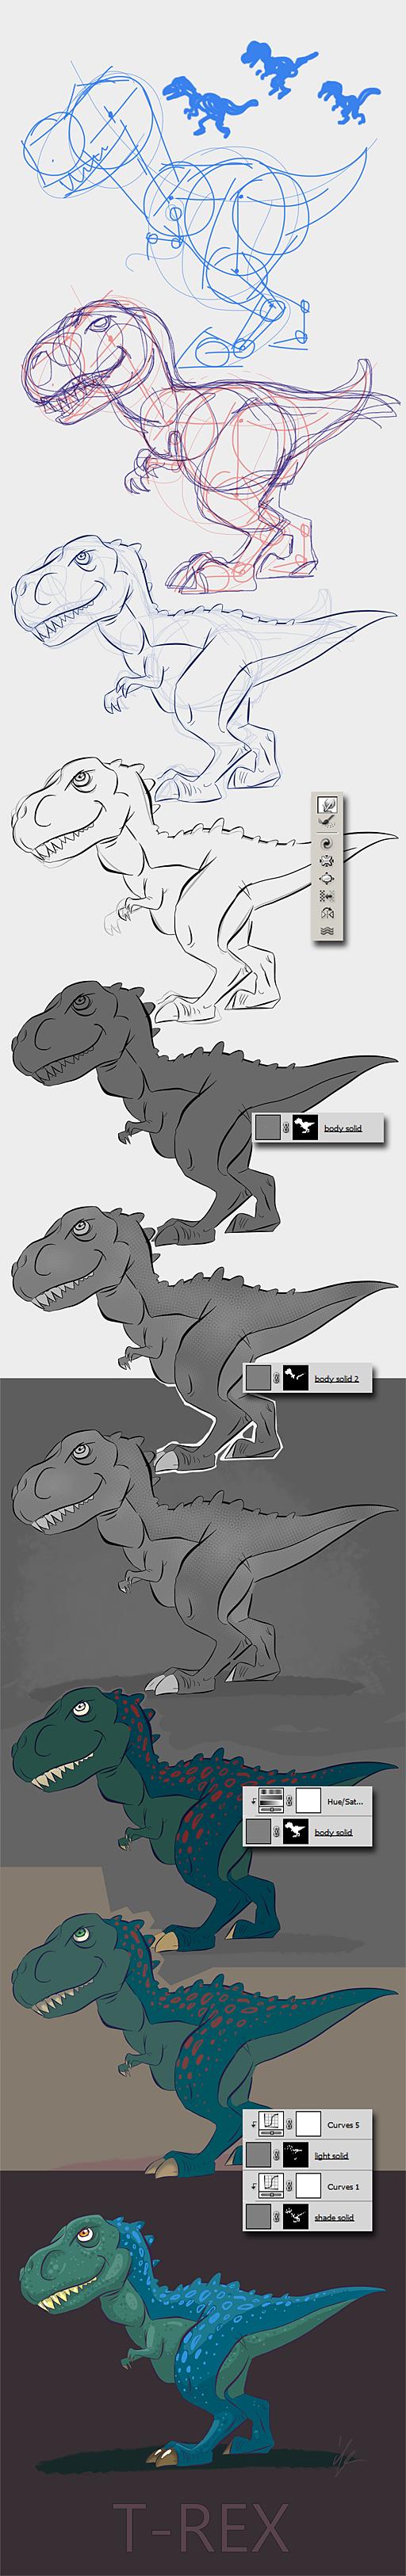 T-Rex:wip